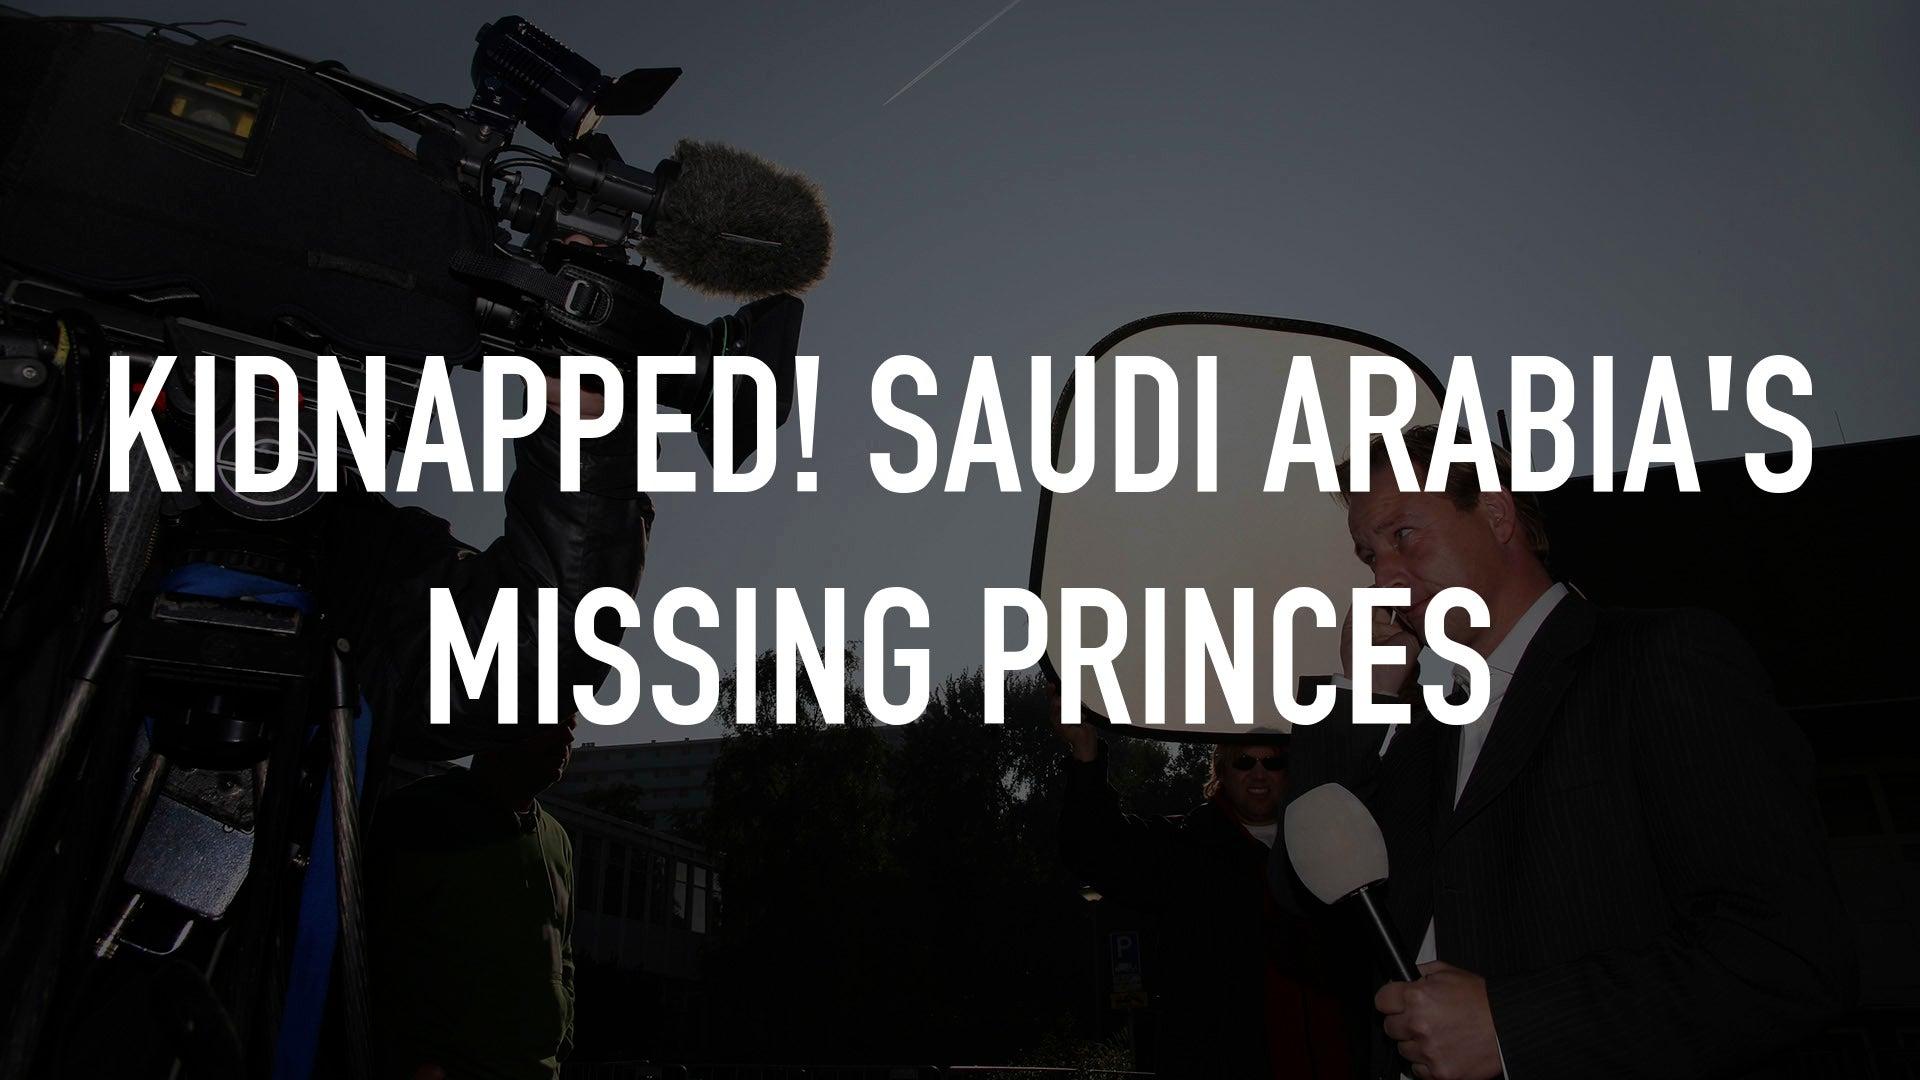 Kidnapped! Saudi Arabia's Missing Princes